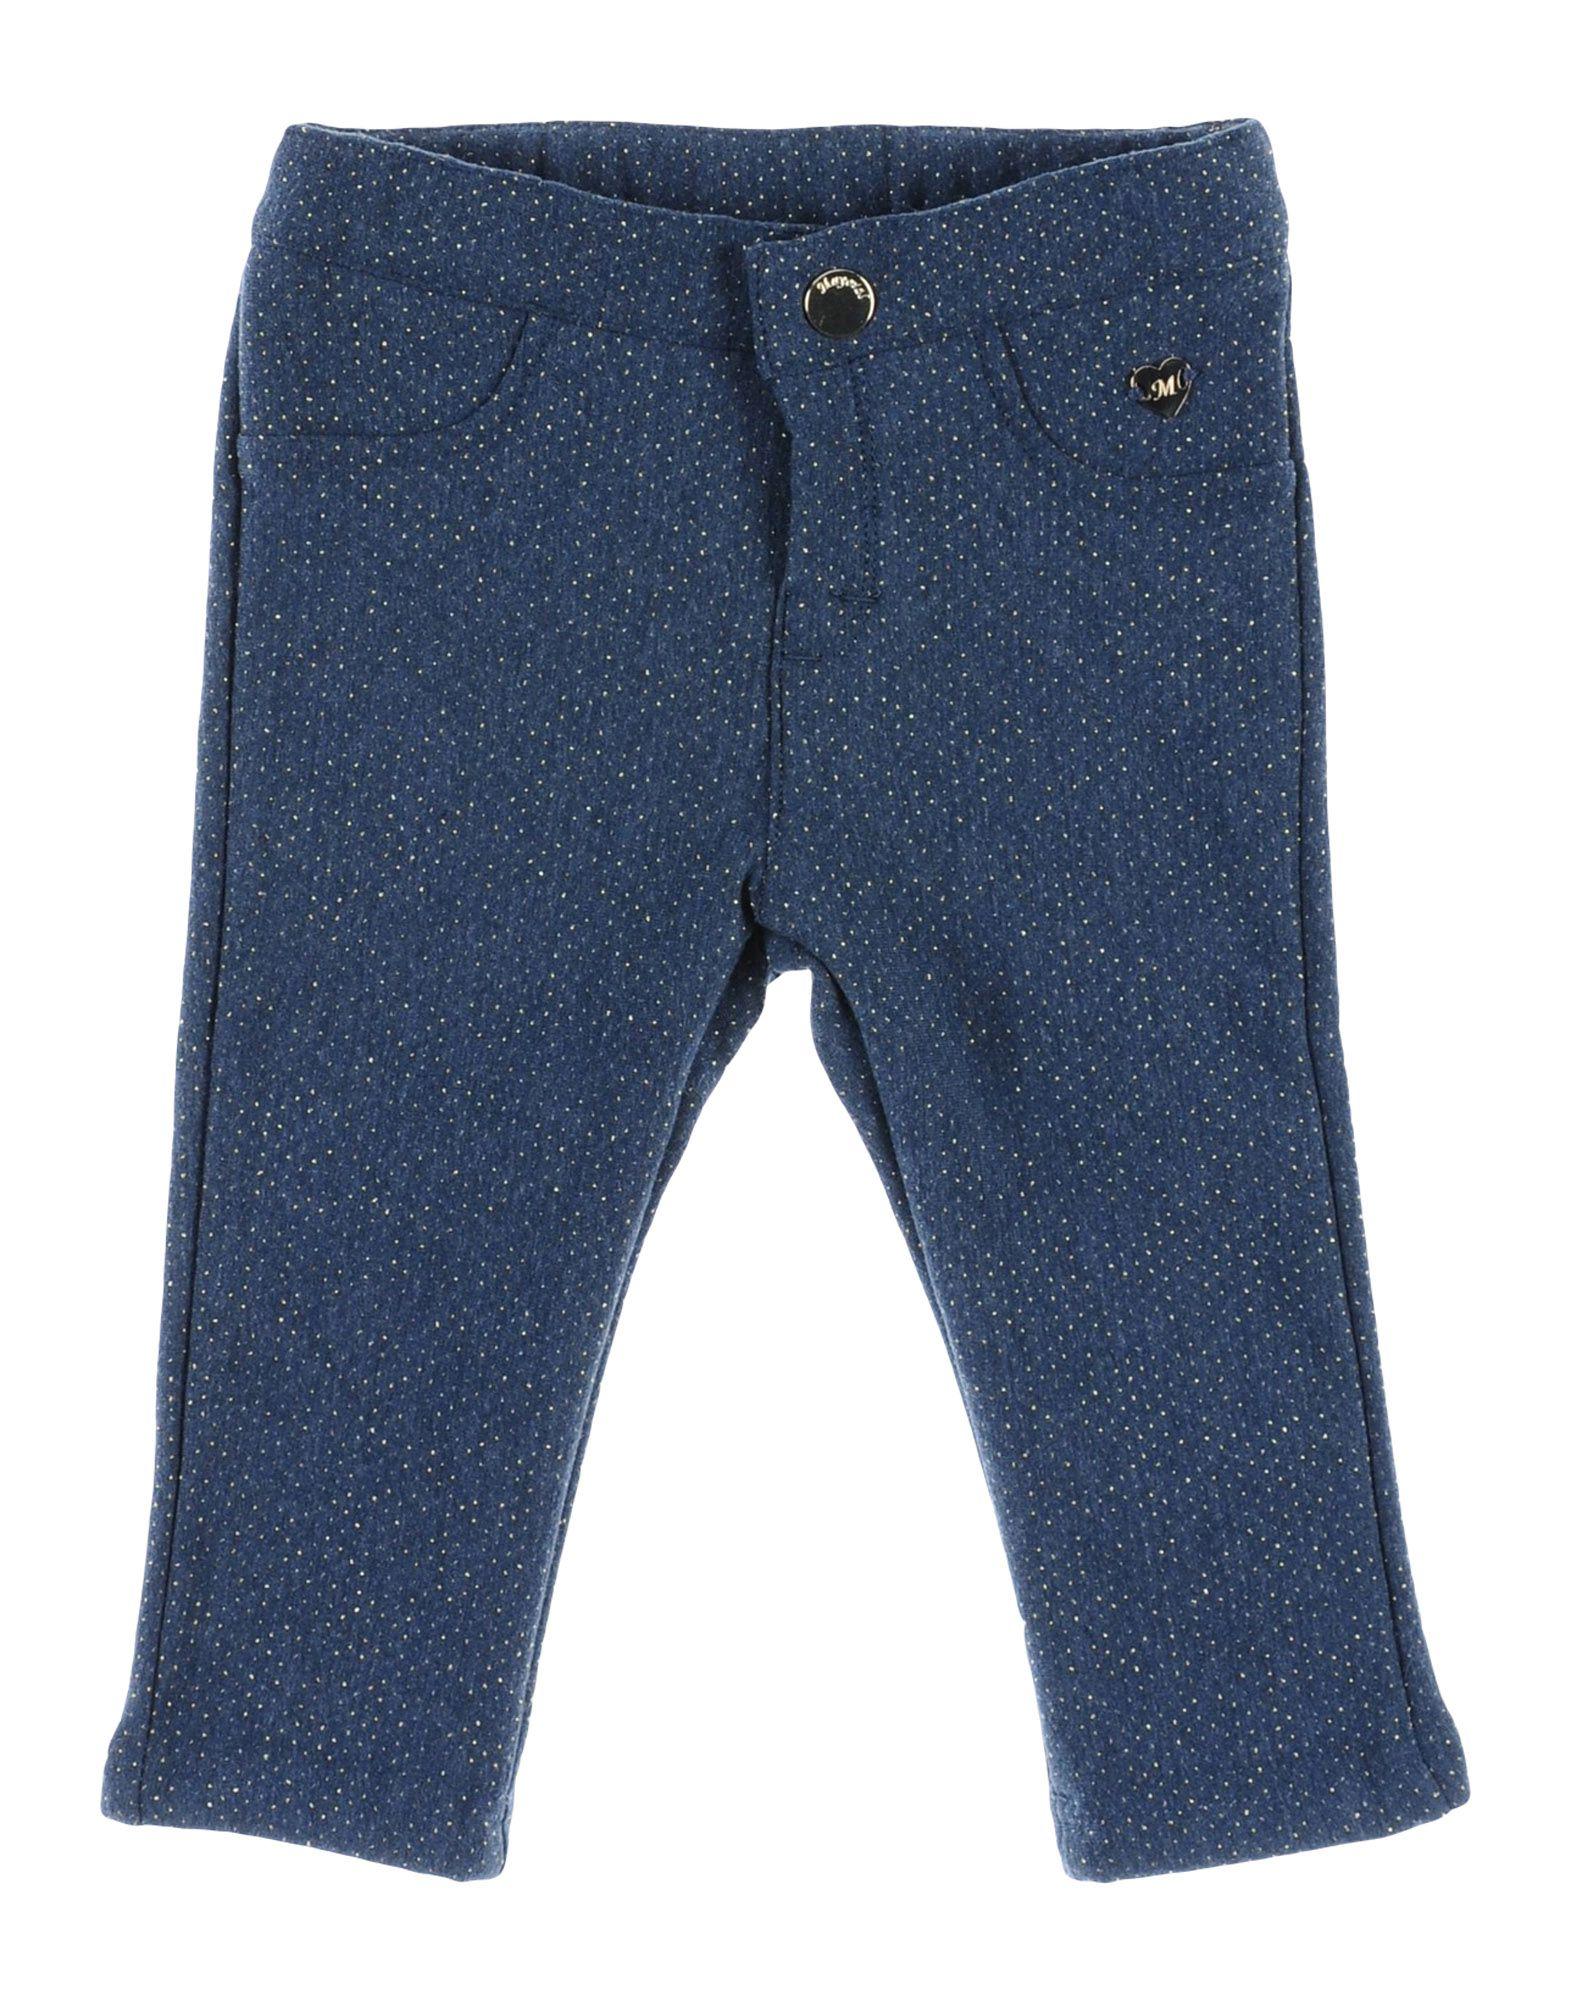 MAYORAL Casual Pants in Dark Blue